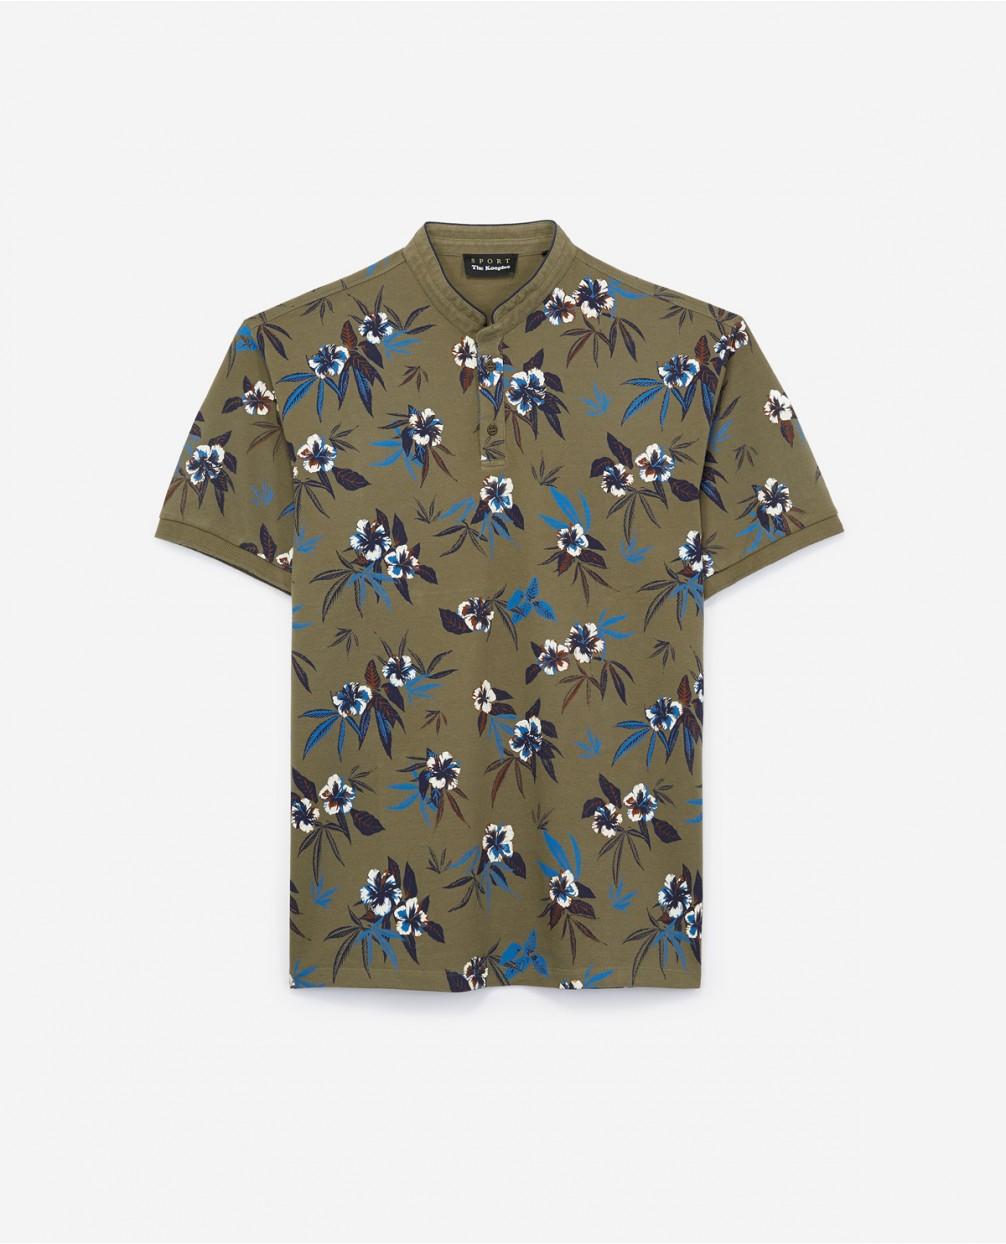 ca4e2747b7 Collarless cotton piqué polo shirt with floral print